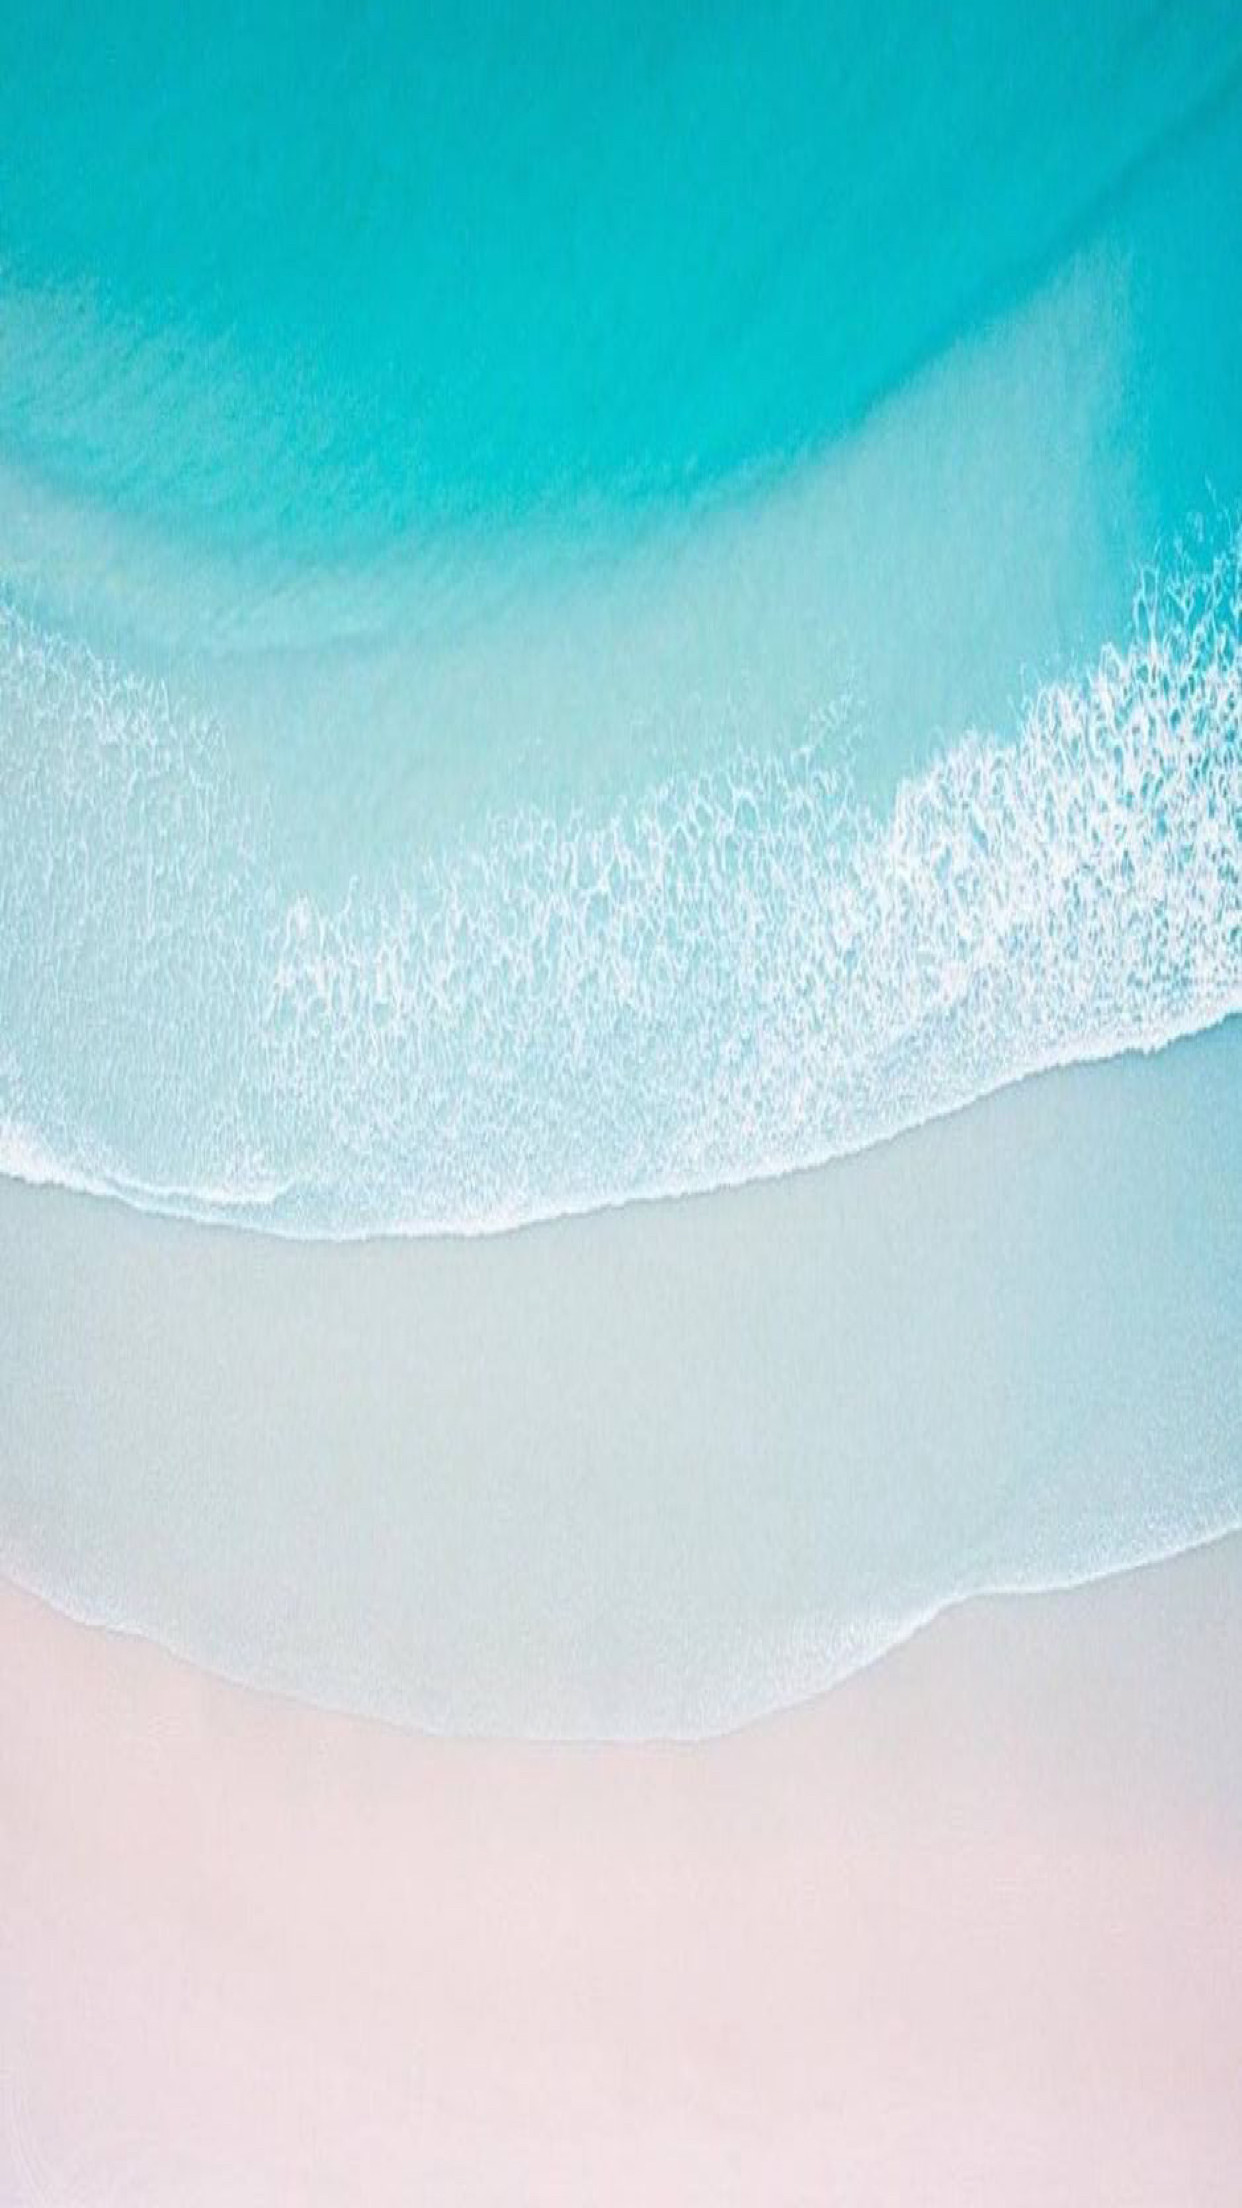 iOS 11, Turquoise, sand, beach, ocean, abstract, apple, wallpaper